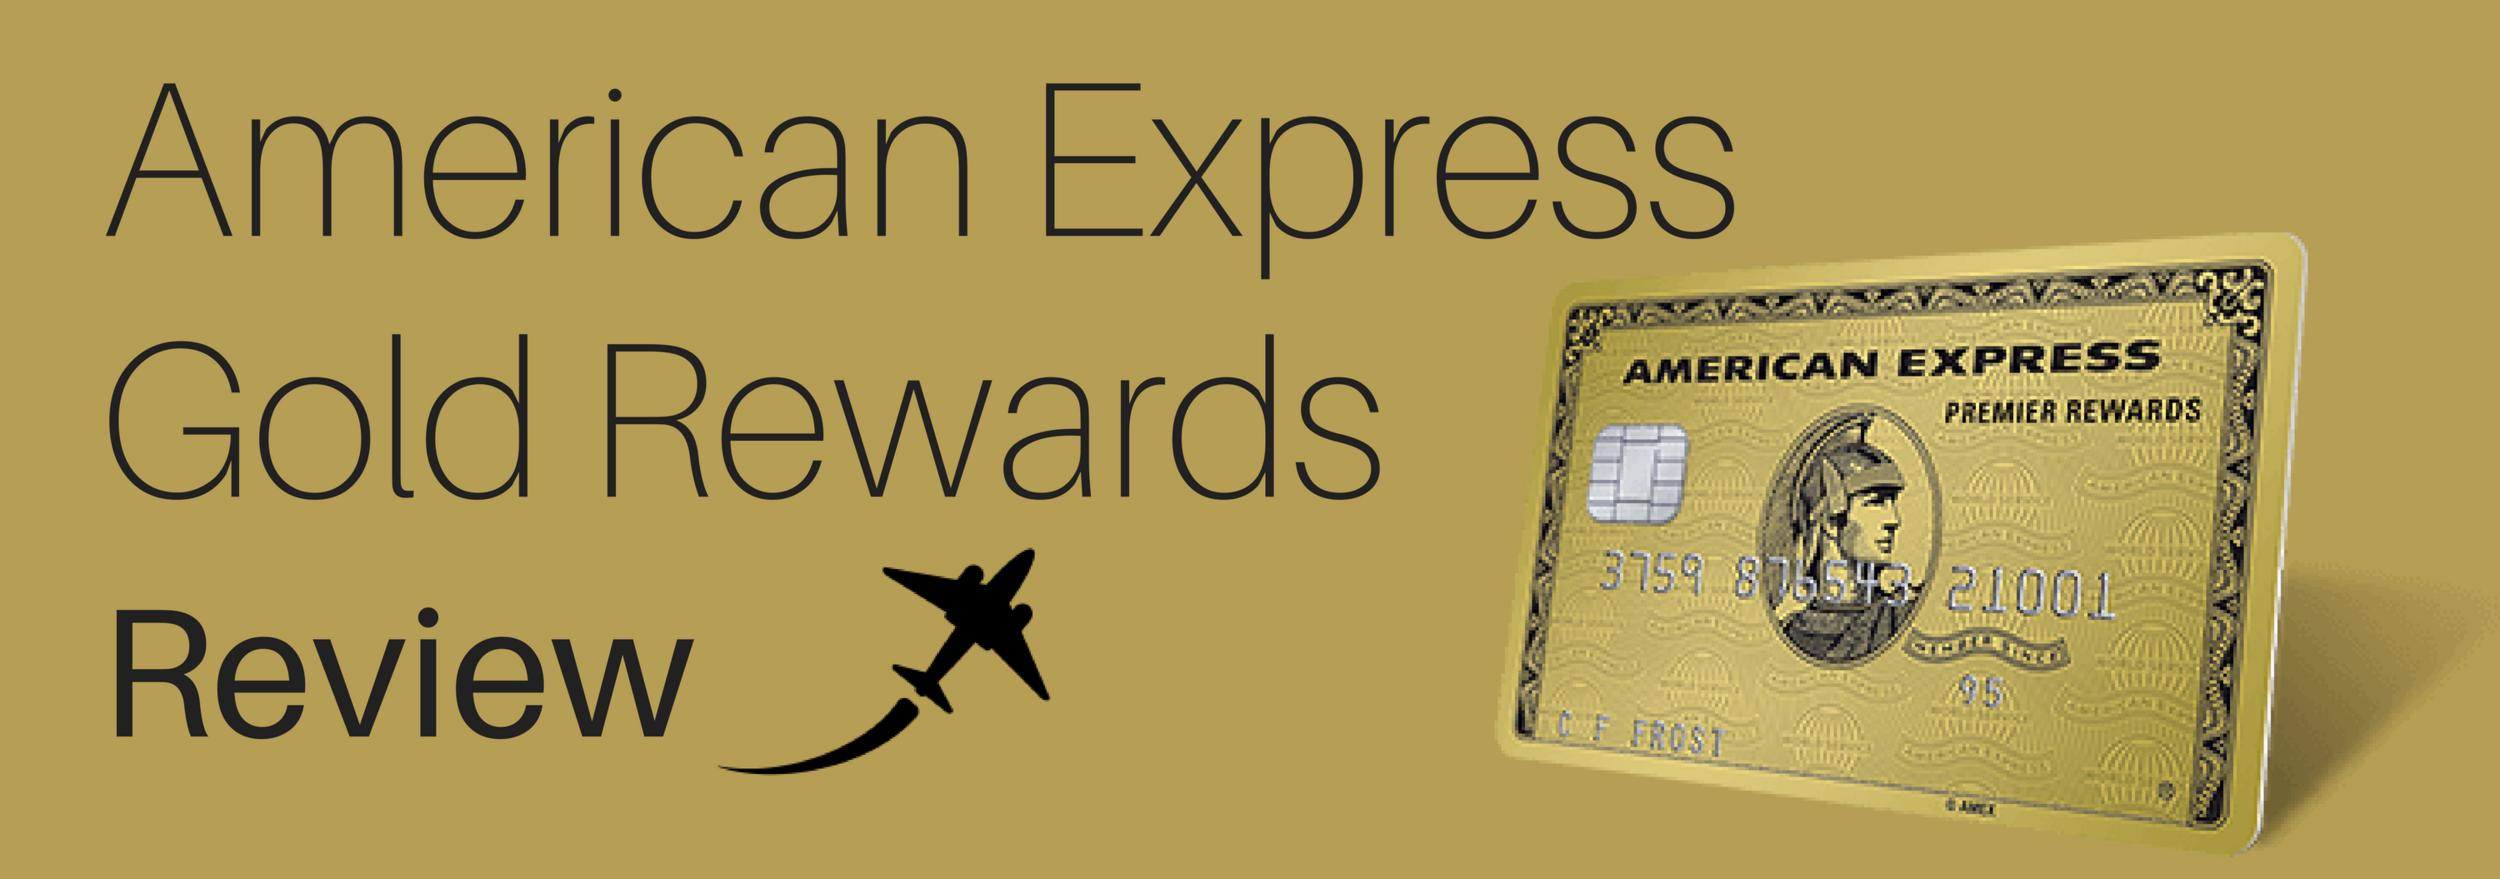 American Express Banner